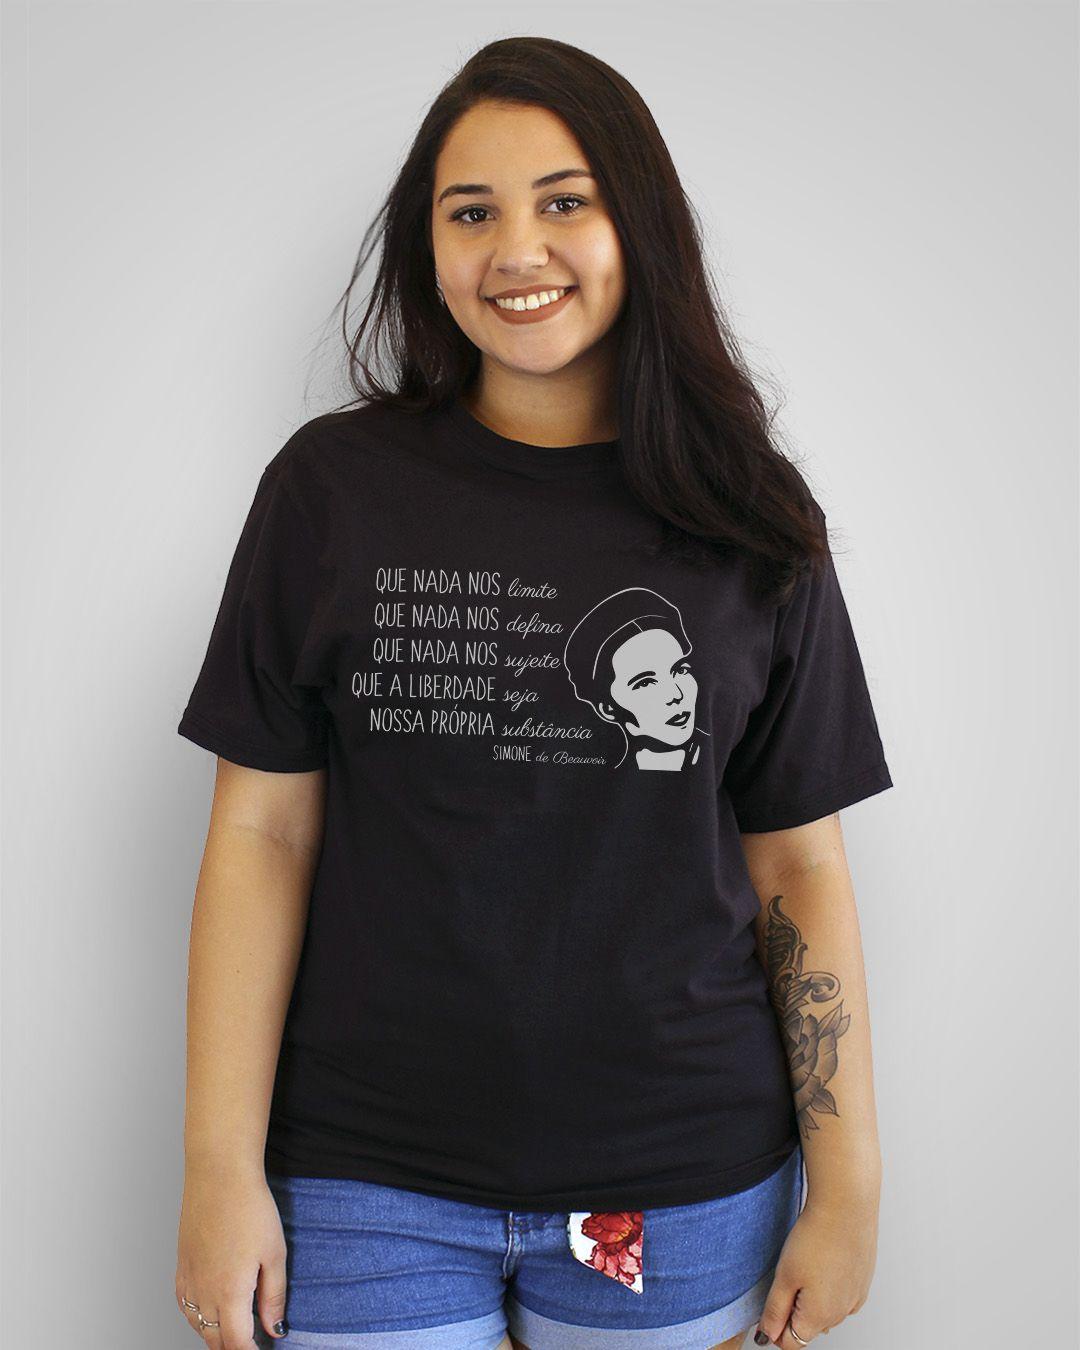 Camiseta Que nada nos limite... - Simone de Beauvoir